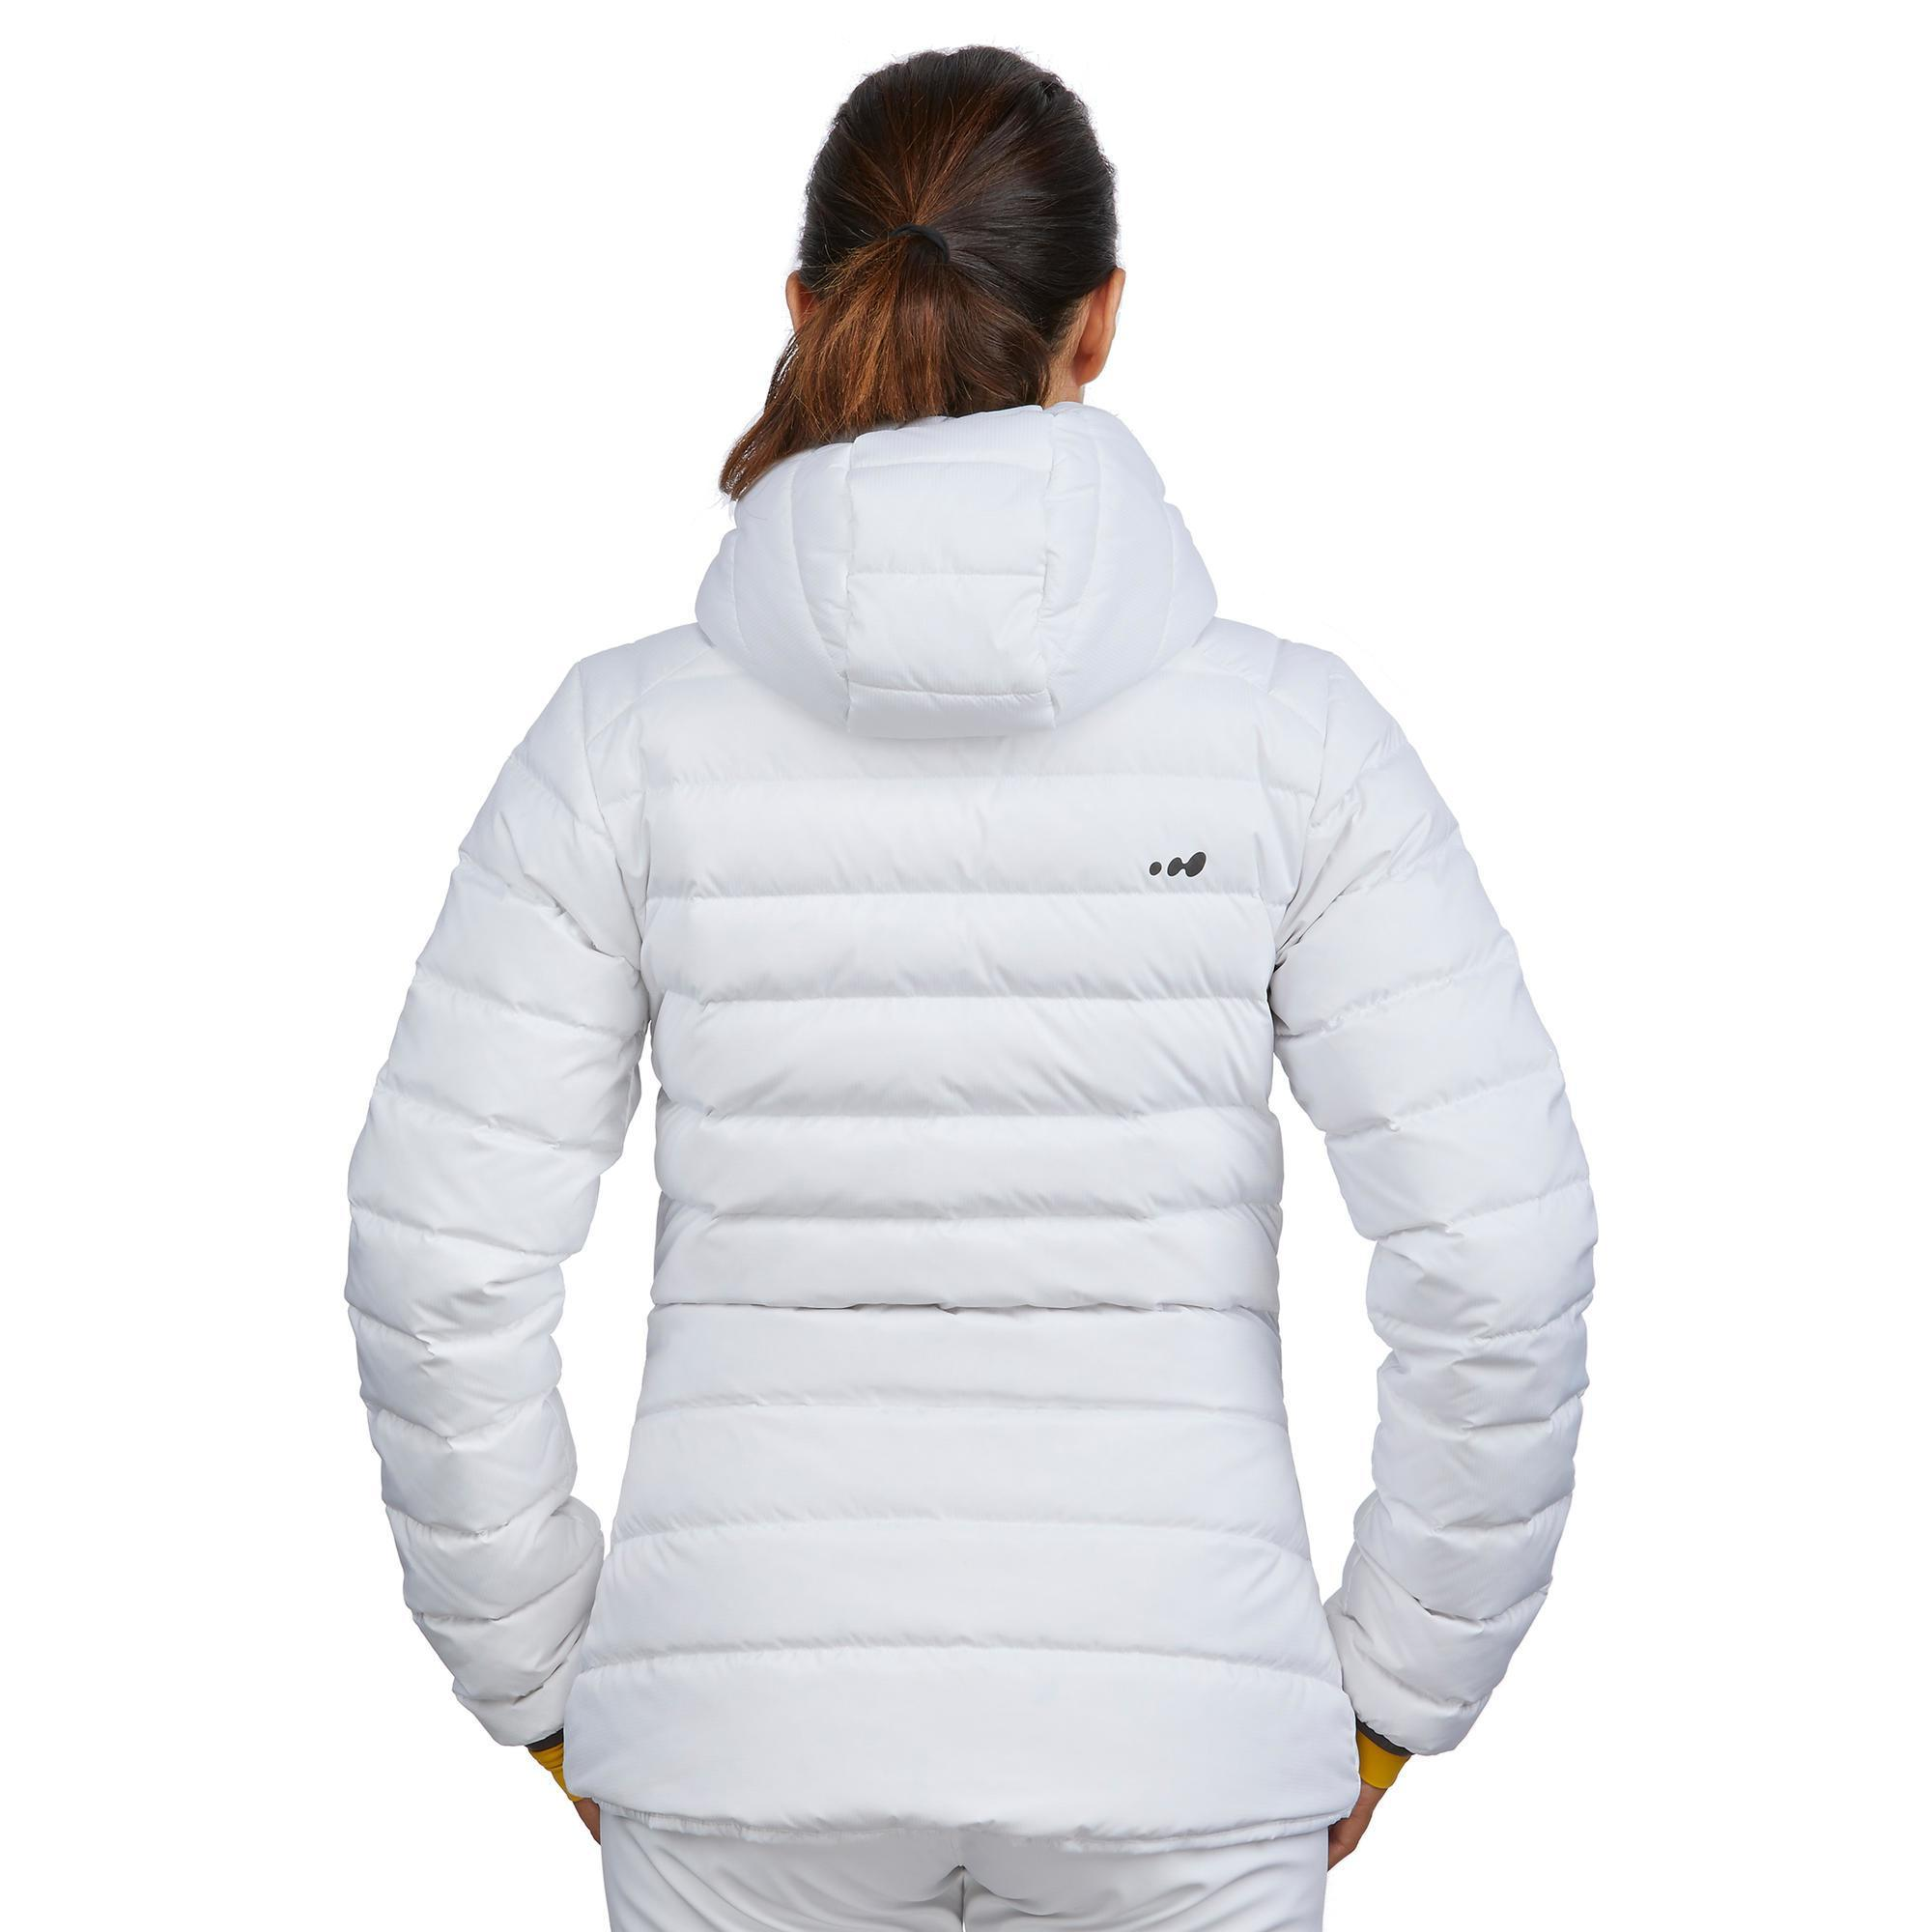 Dons Dames Winterjas.500 Dons Warm Jas Ski Voor Dames Jkt Qfgx1fx